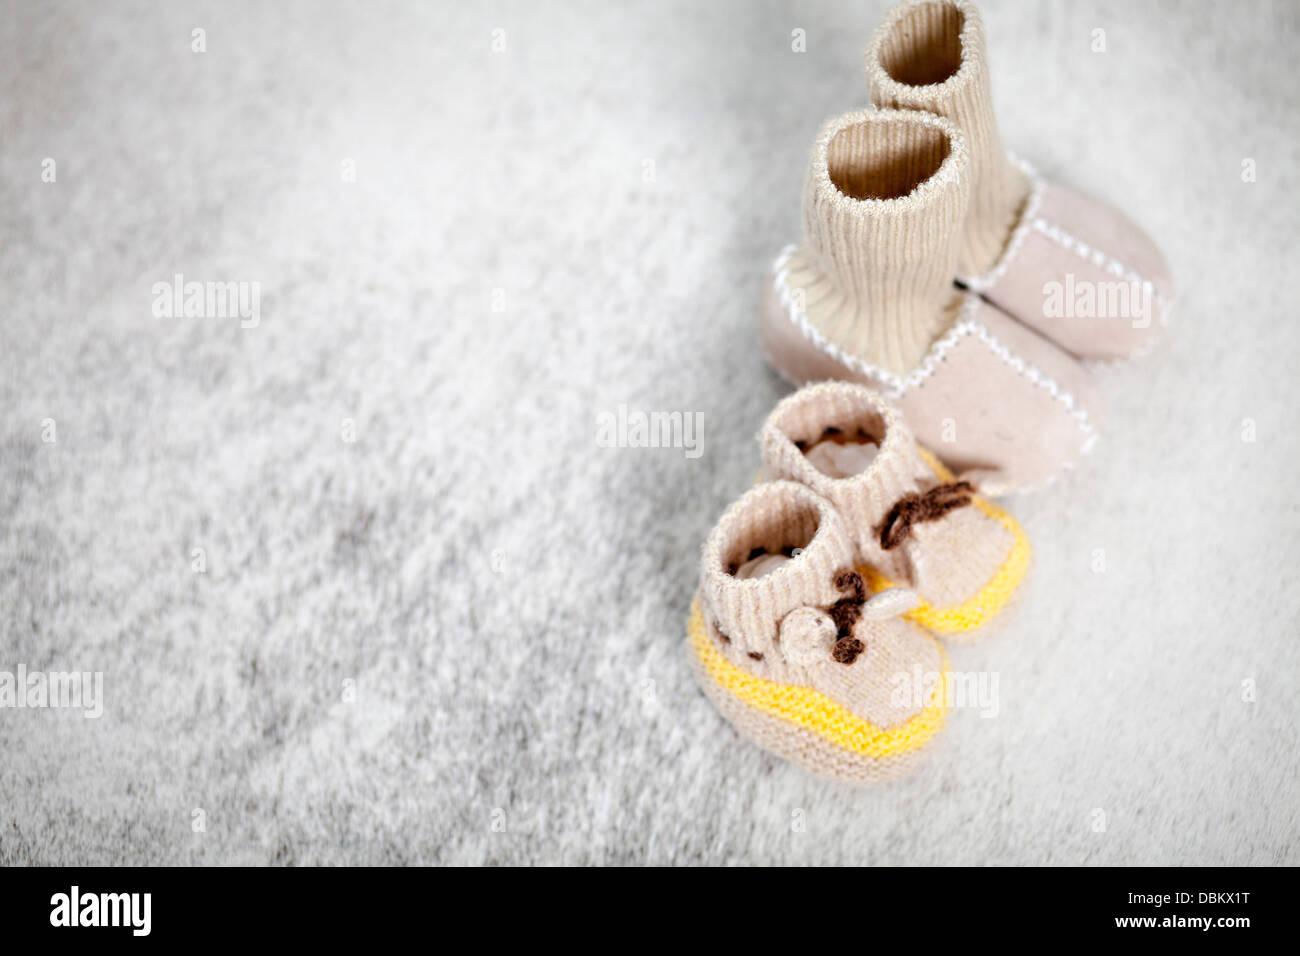 Baby Booties Beside Slipper Socks, Munich, Bavaria, Germany - Stock Image